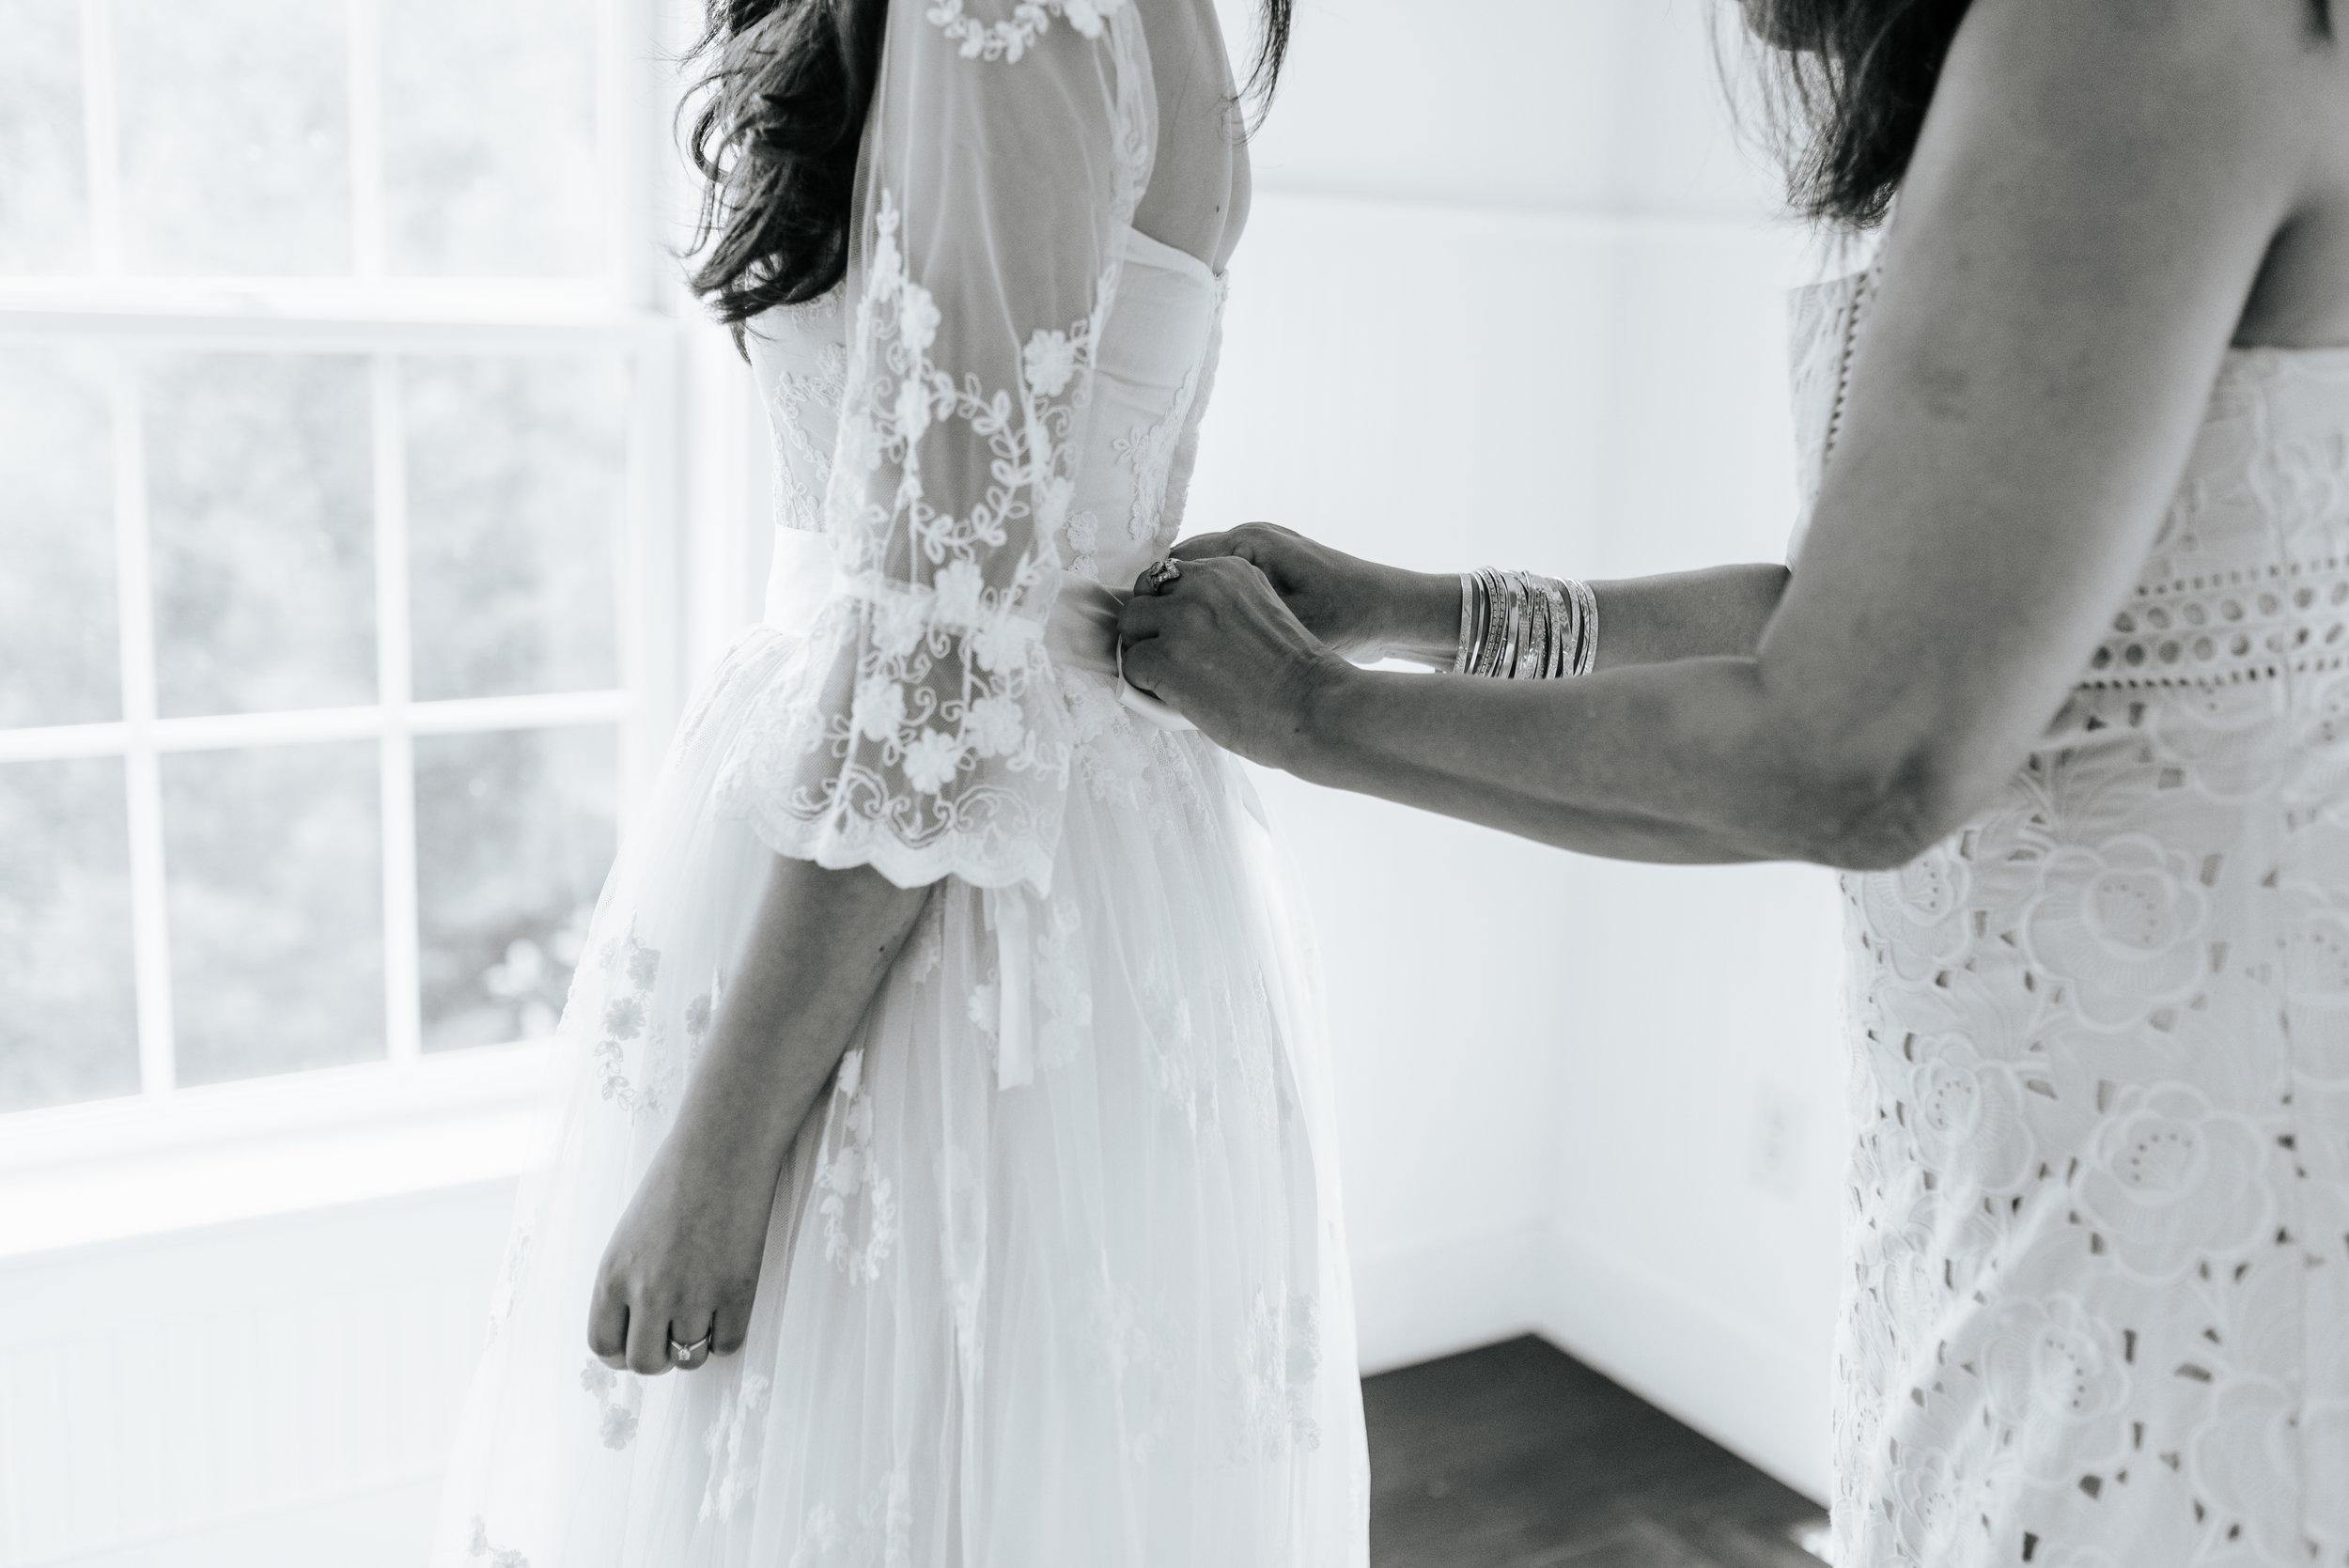 Veritas-Vineyards-and-Winery-Wedding-Photography-Afton-Virginia-Yasmin-Seth-Photography-by-V-9110.jpg